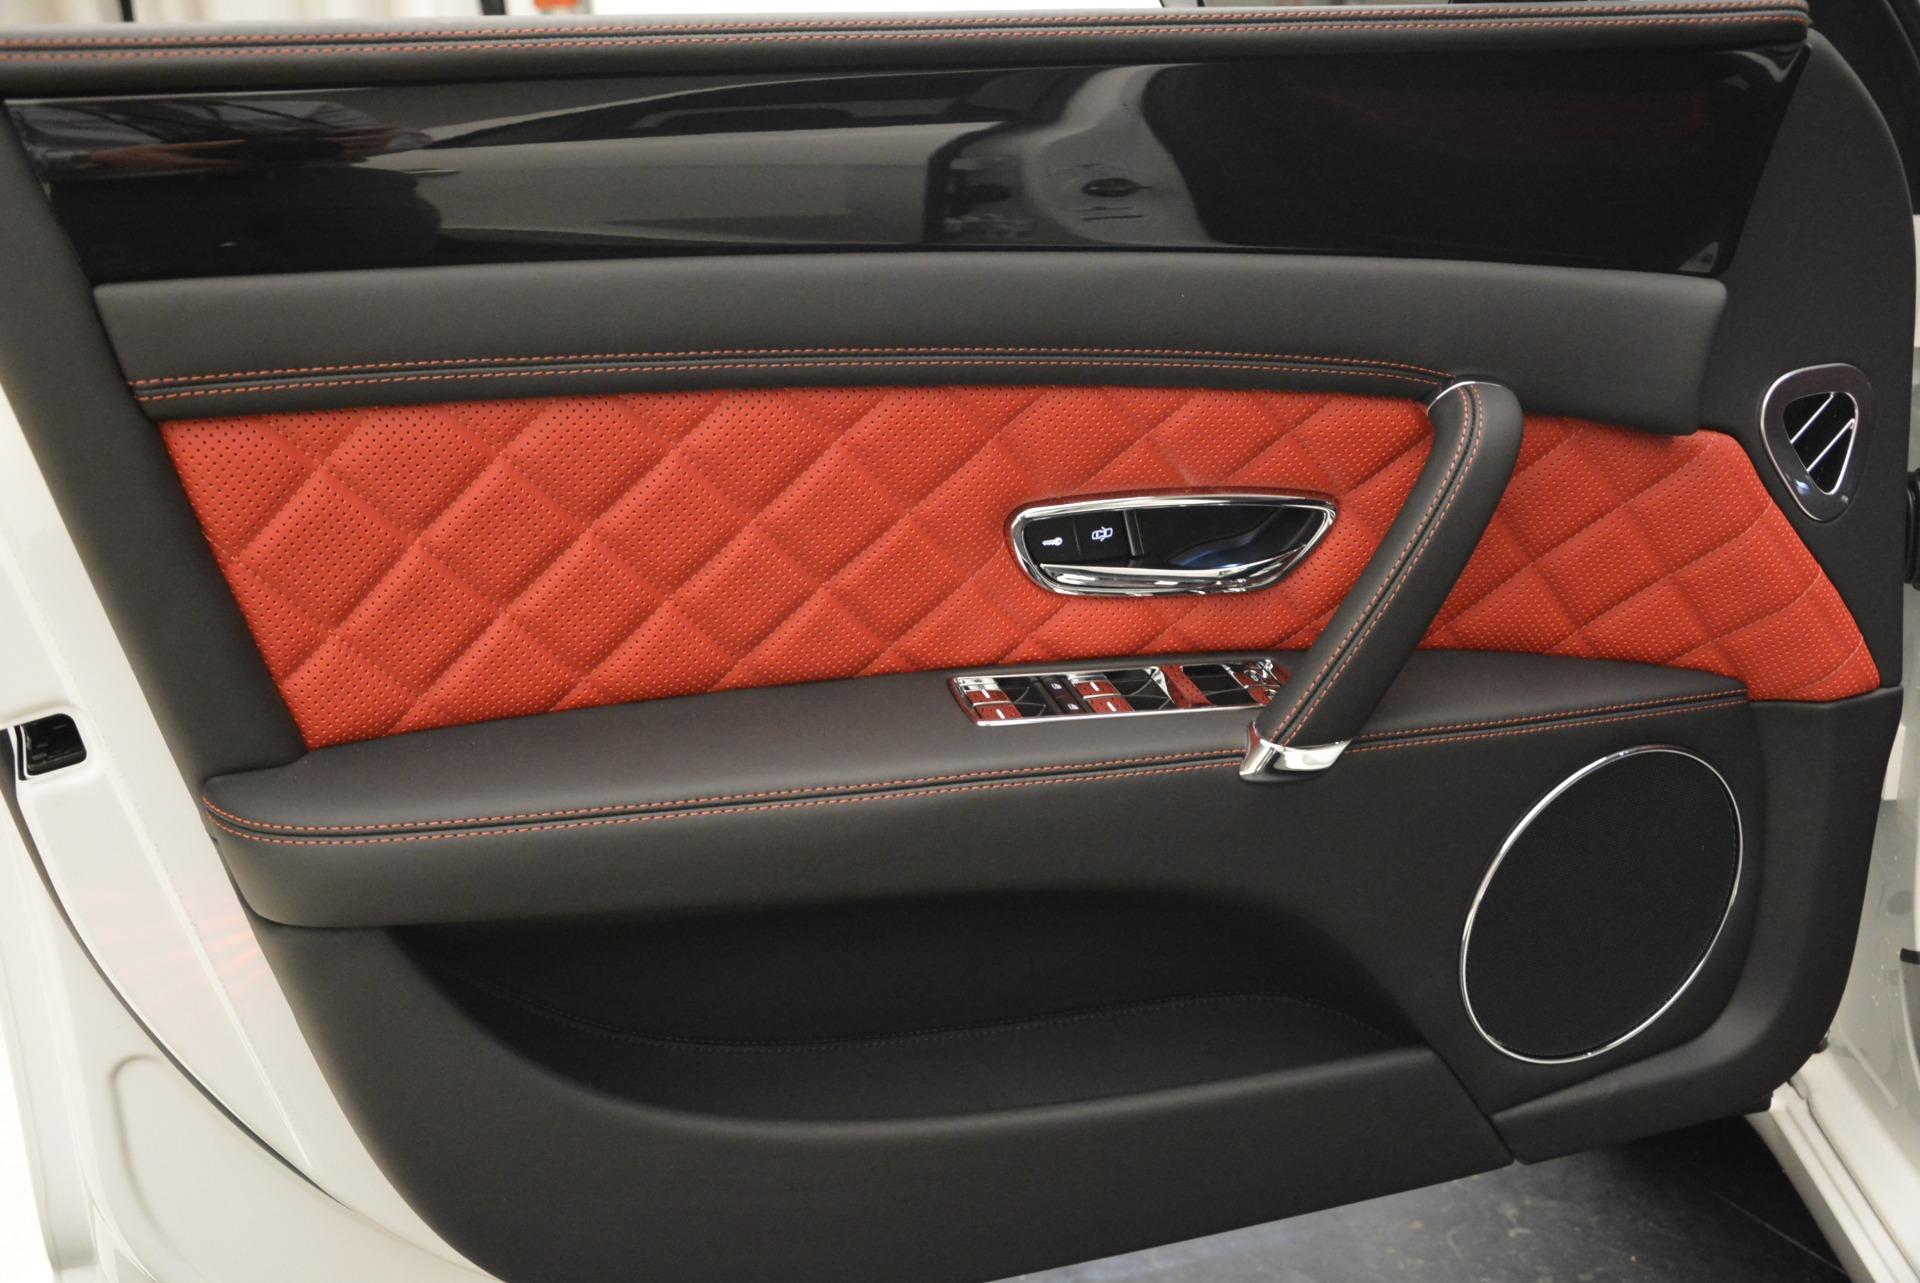 New 2018 Bentley Flying Spur V8 S Black Edition For Sale In Westport, CT 2096_p17